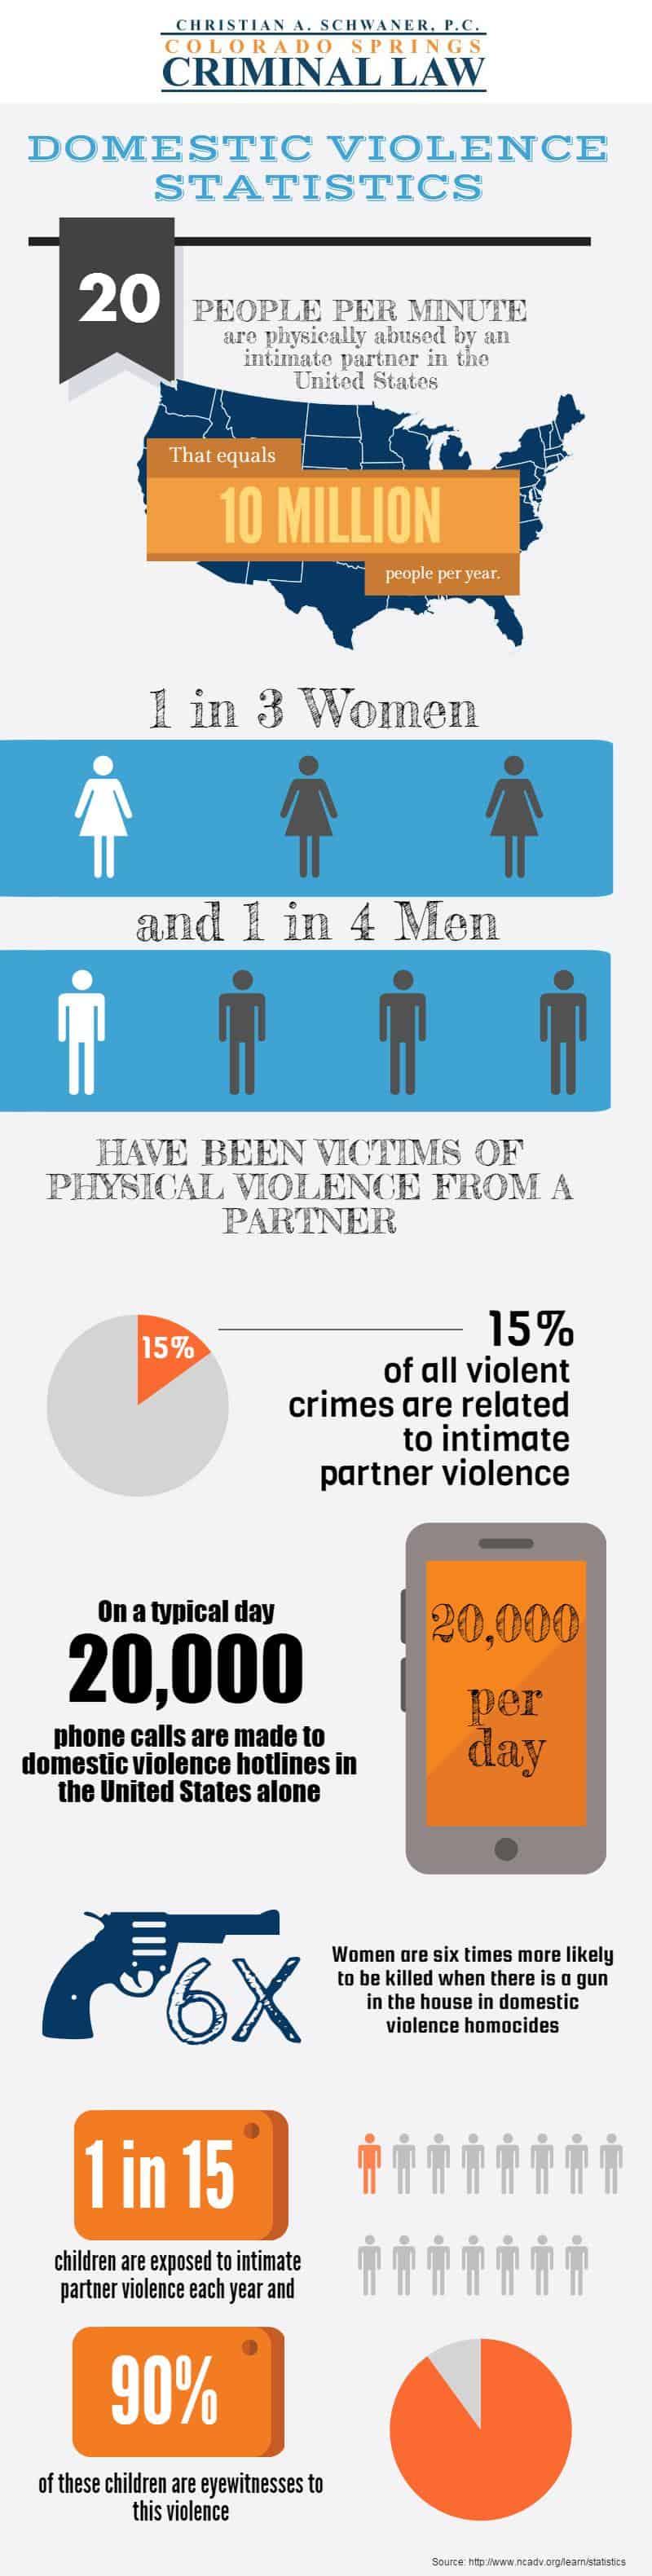 Domestic Violence Statistics